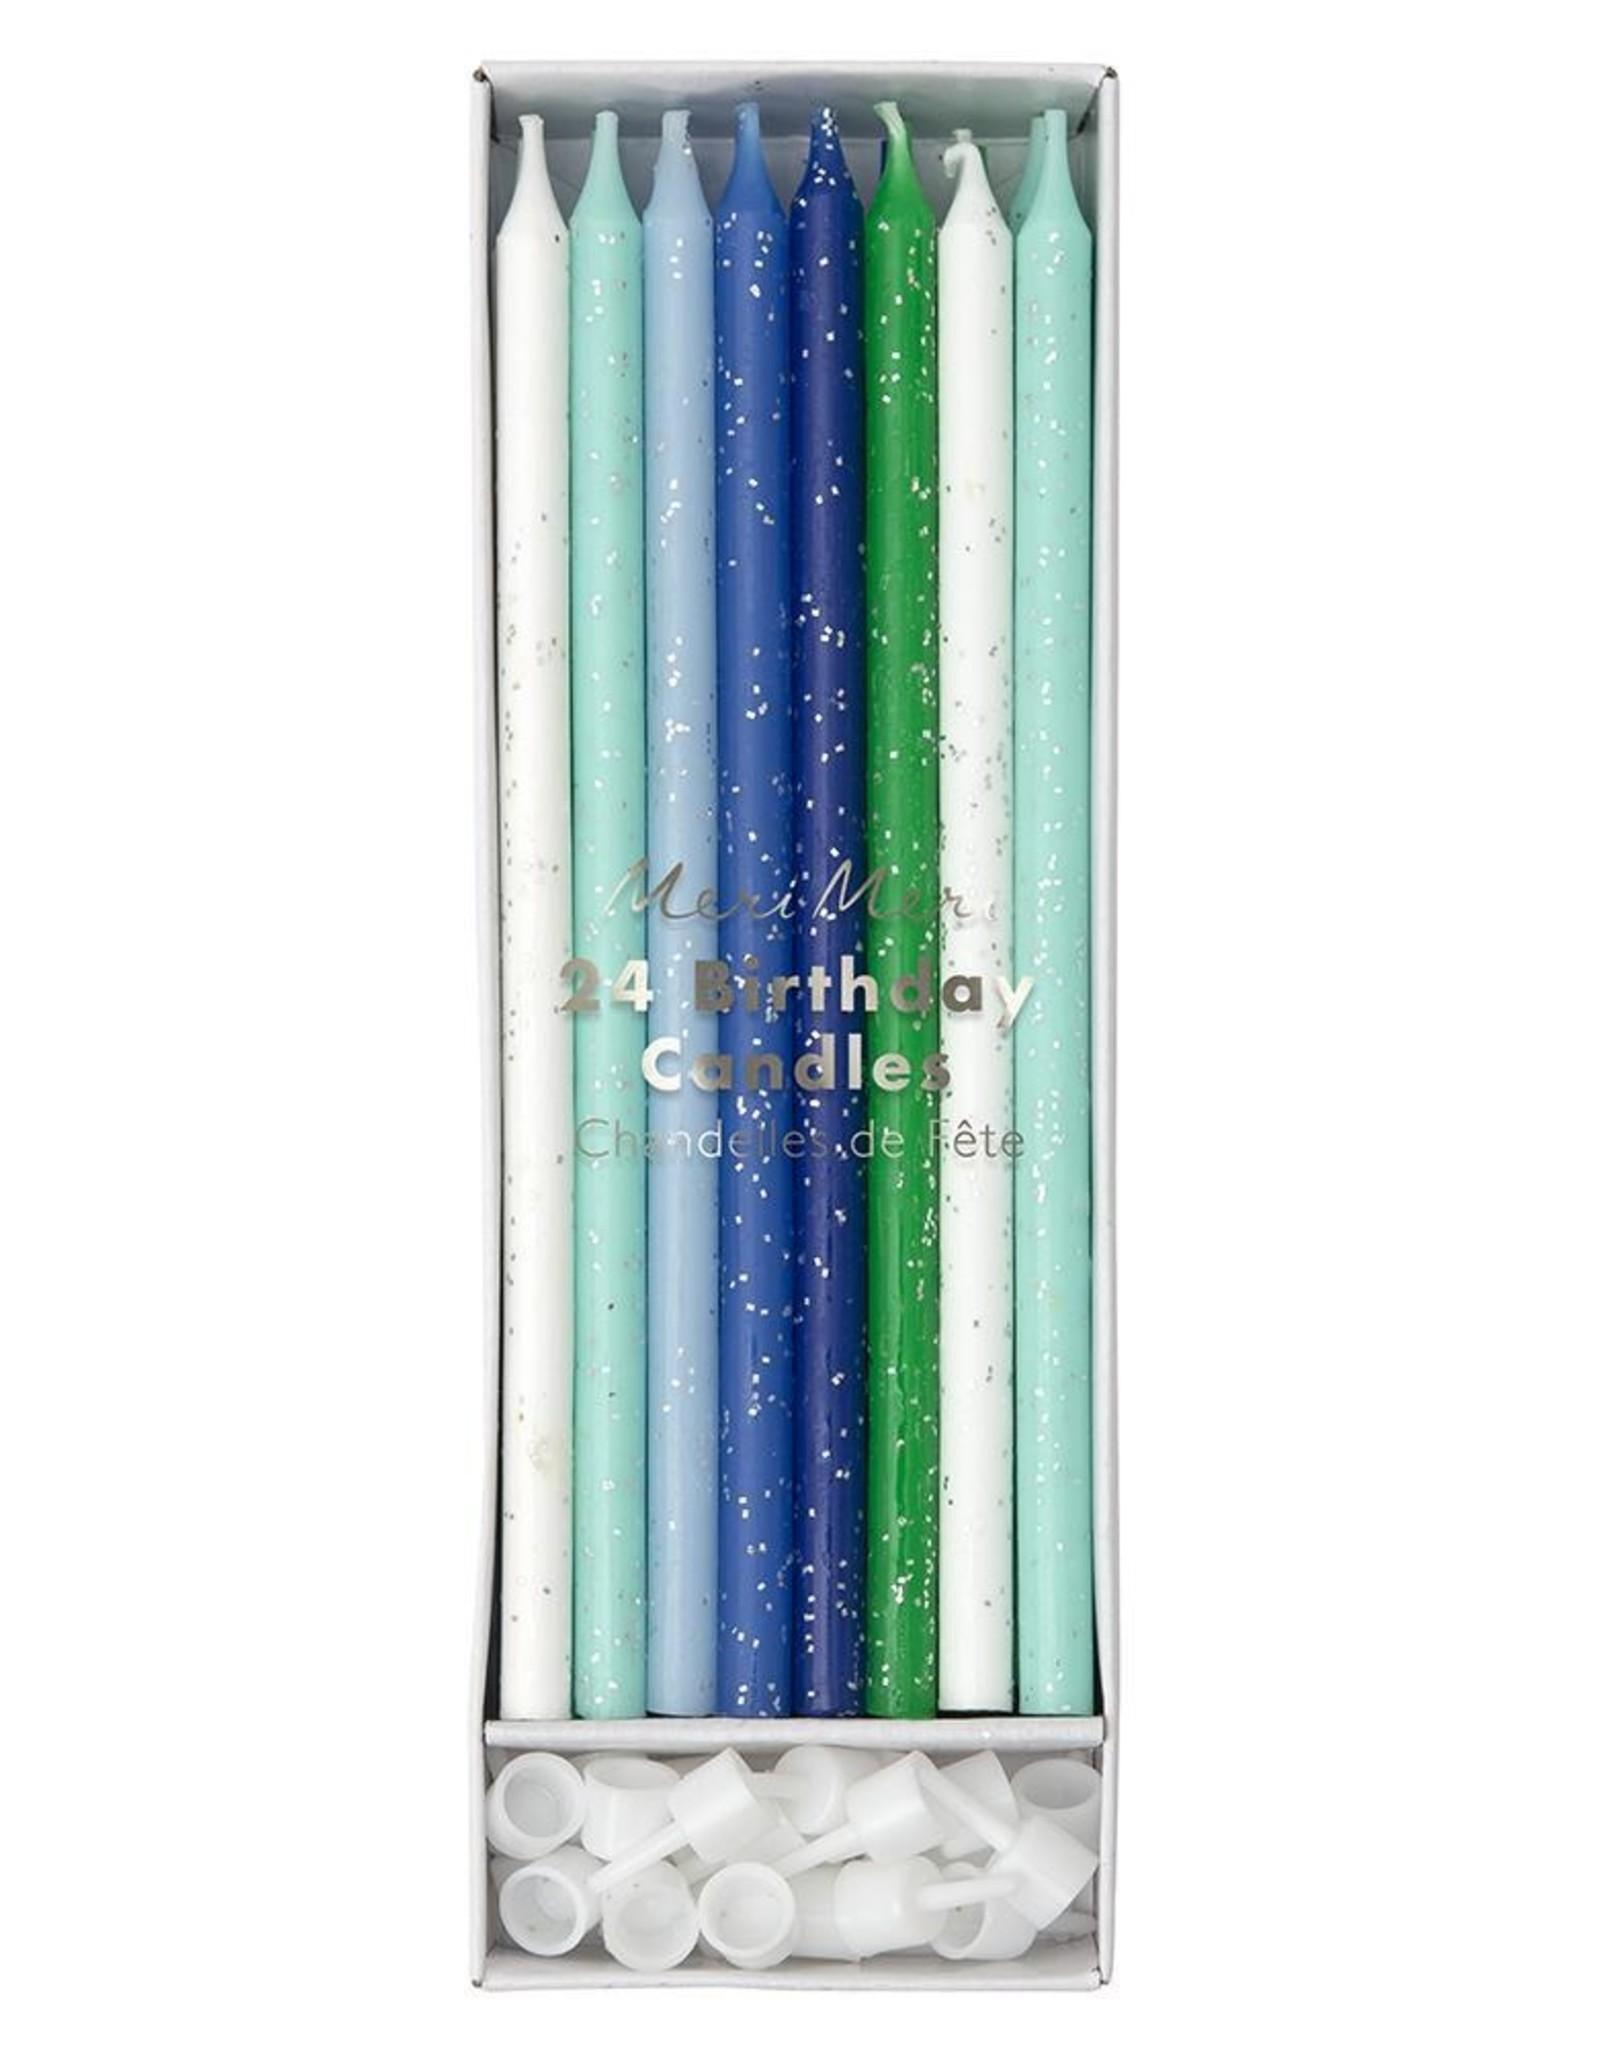 Meri Meri Meri Meri | Blue Birthday Candles